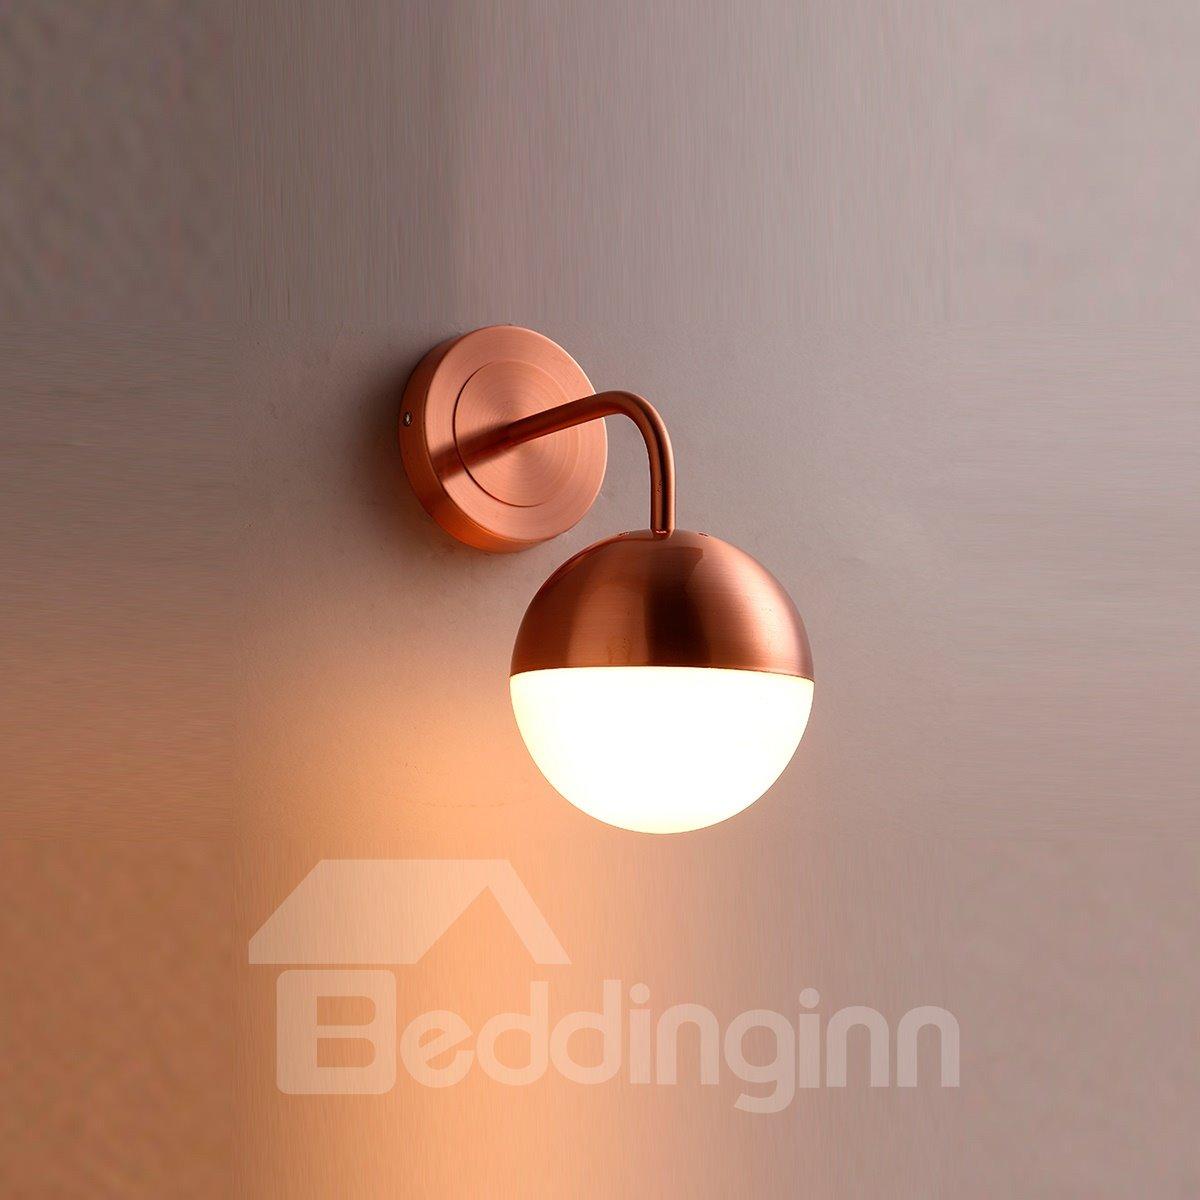 Golden Basis Hardware and Glass Modern 1-Head Decorative Wall Light